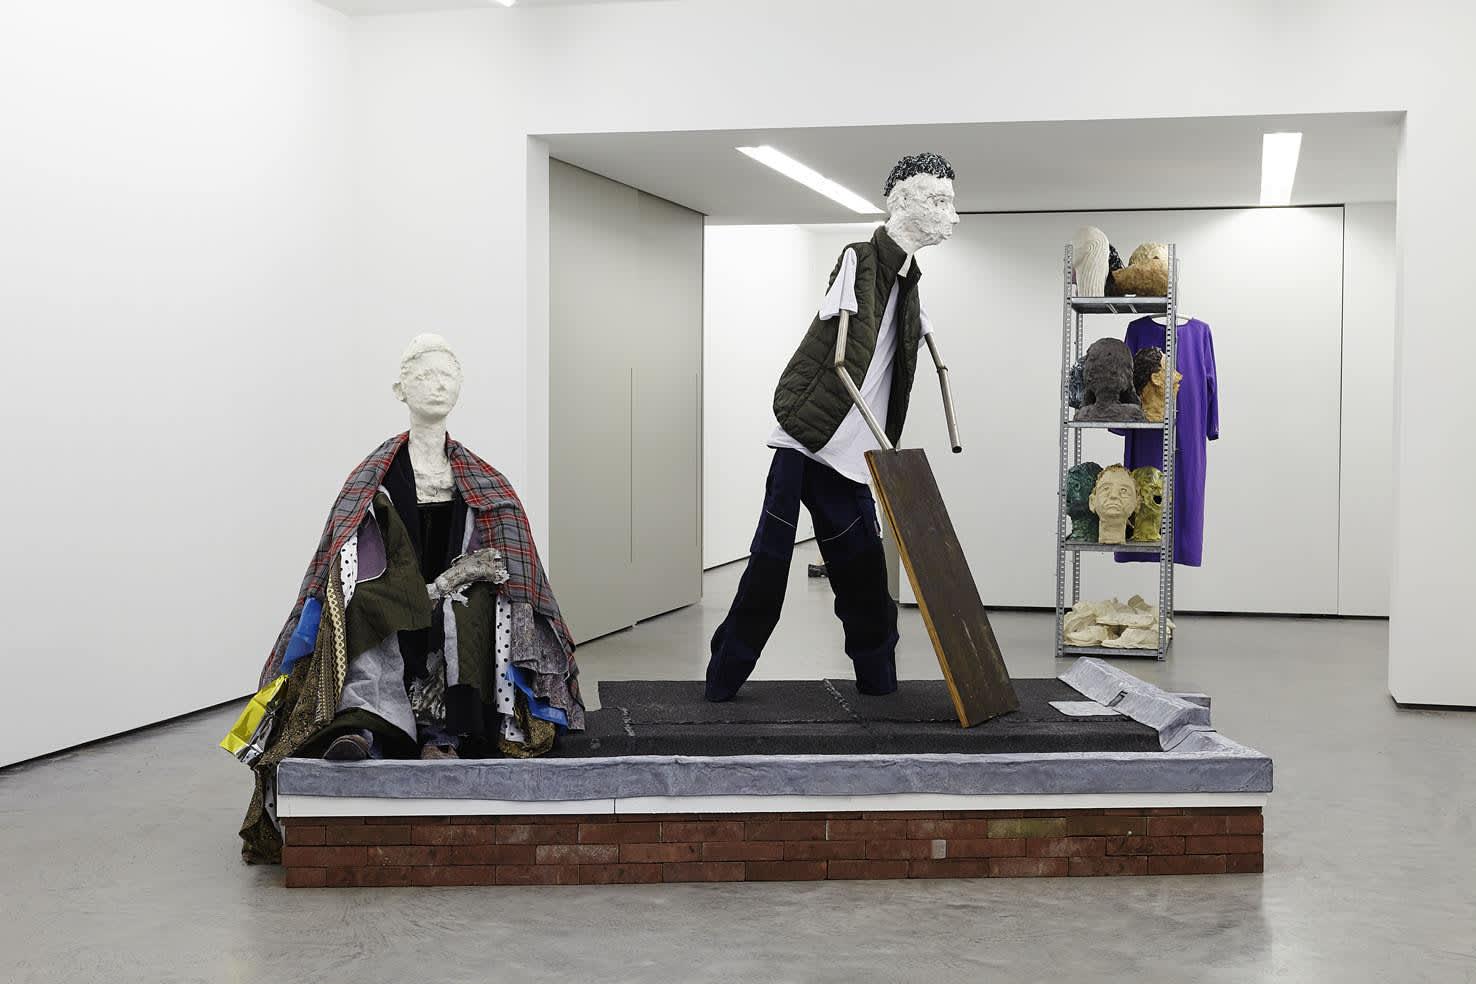 Kunst in woord #1 - Sander Breure & Witte van Hulzen